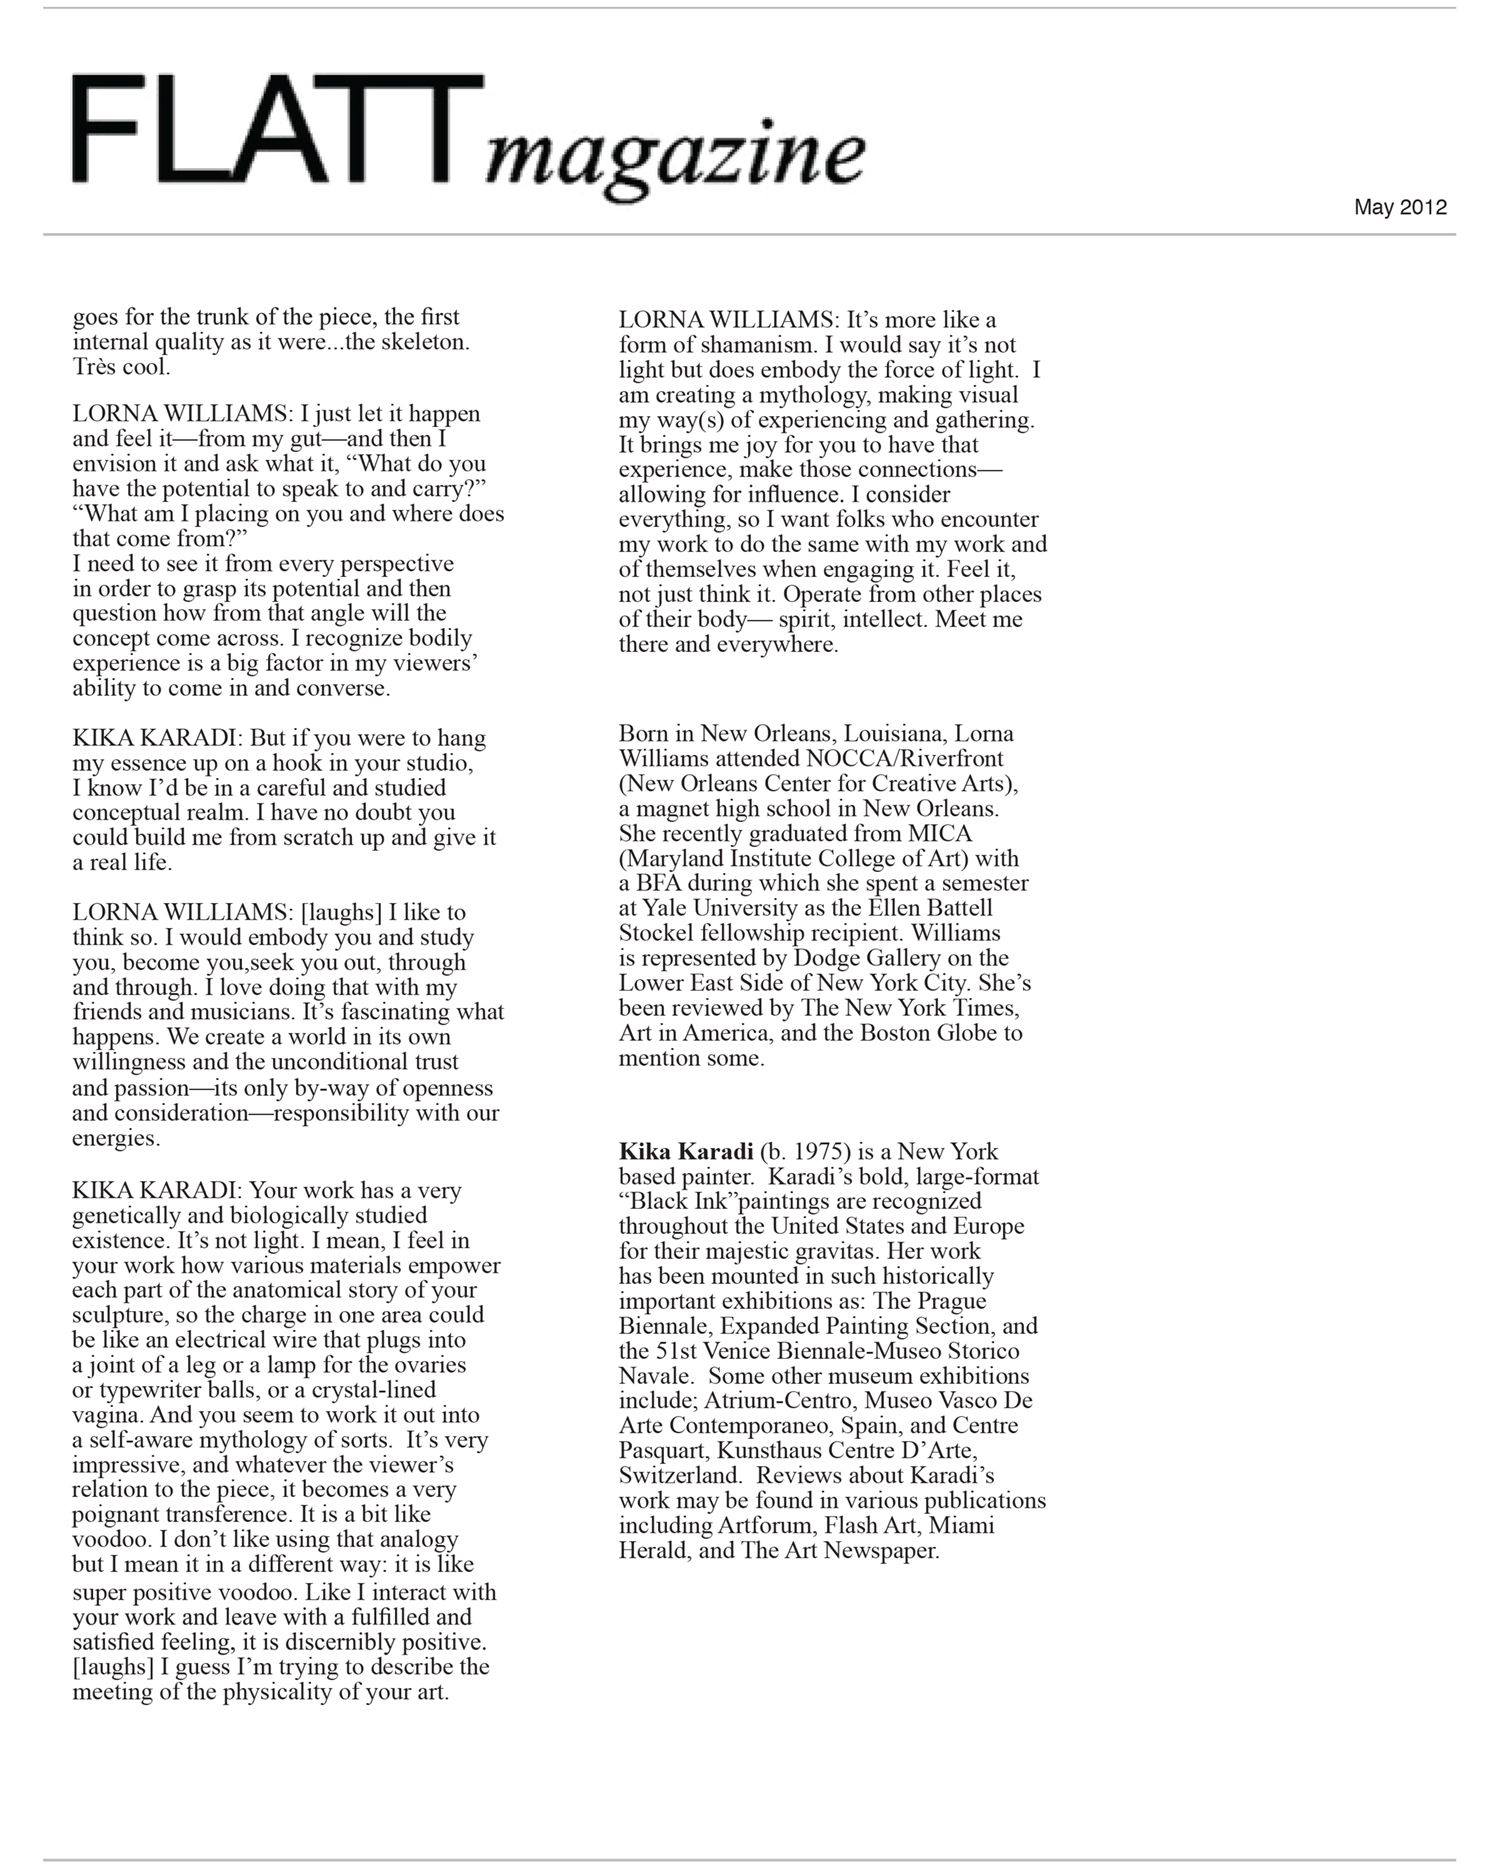 FlattMagazine_4_May 2012.jpg